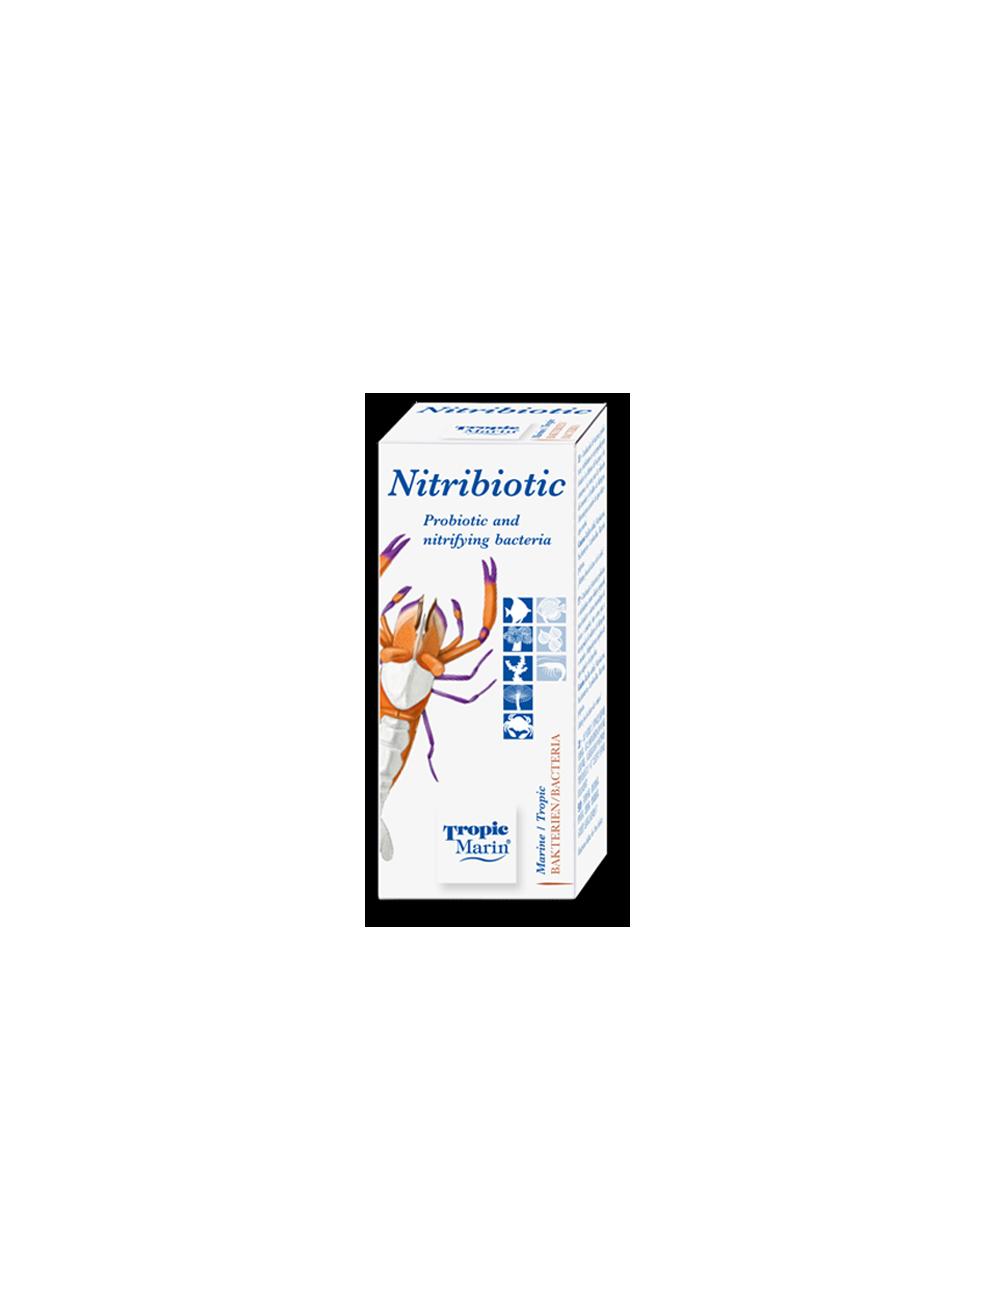 TROPIC MARIN - NITRIBIOTIC - 25 ml - Bactéries pour aquarium